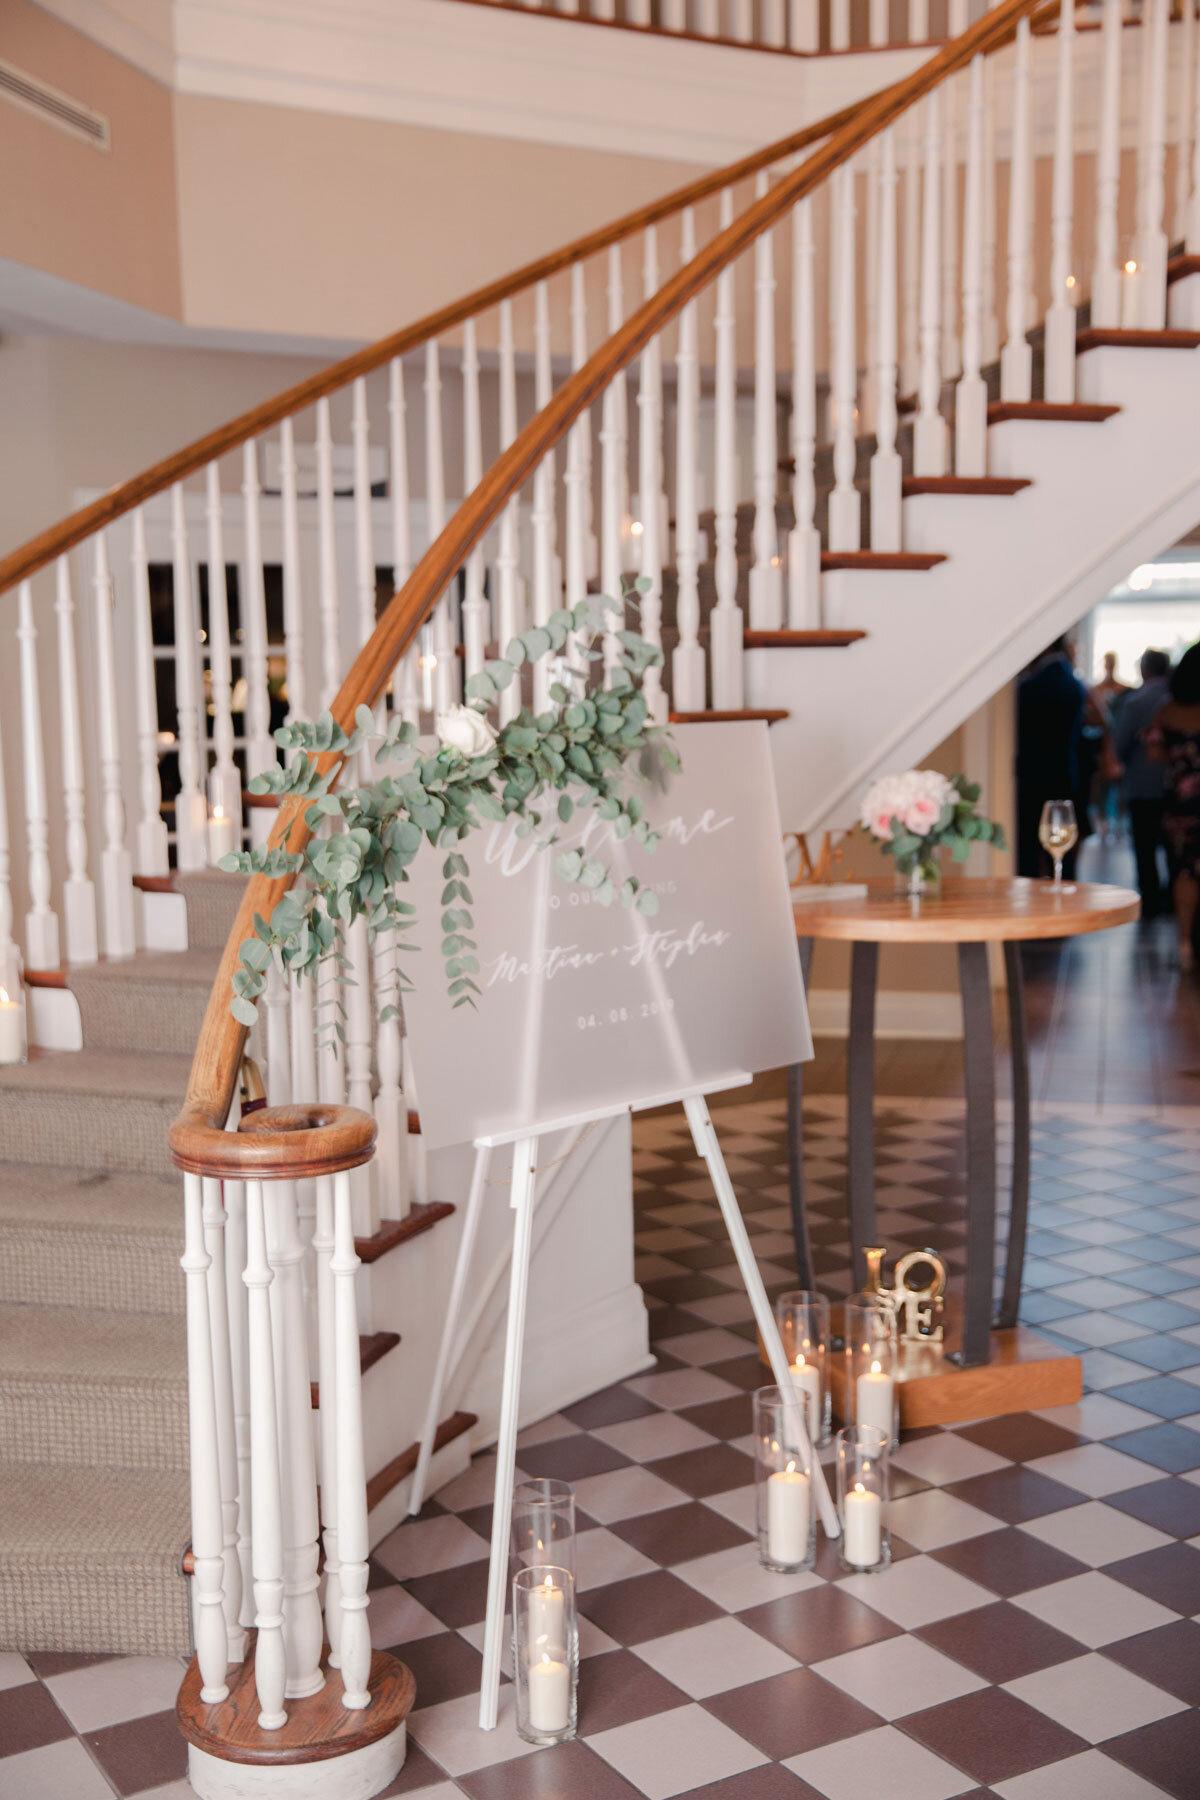 Chateau-des-Charmes-Wedding-Summer-Vineyard-Bride-Niagara-on-the-Lake-photos-by-Gemini-Photography-Ontario-0066.jpg